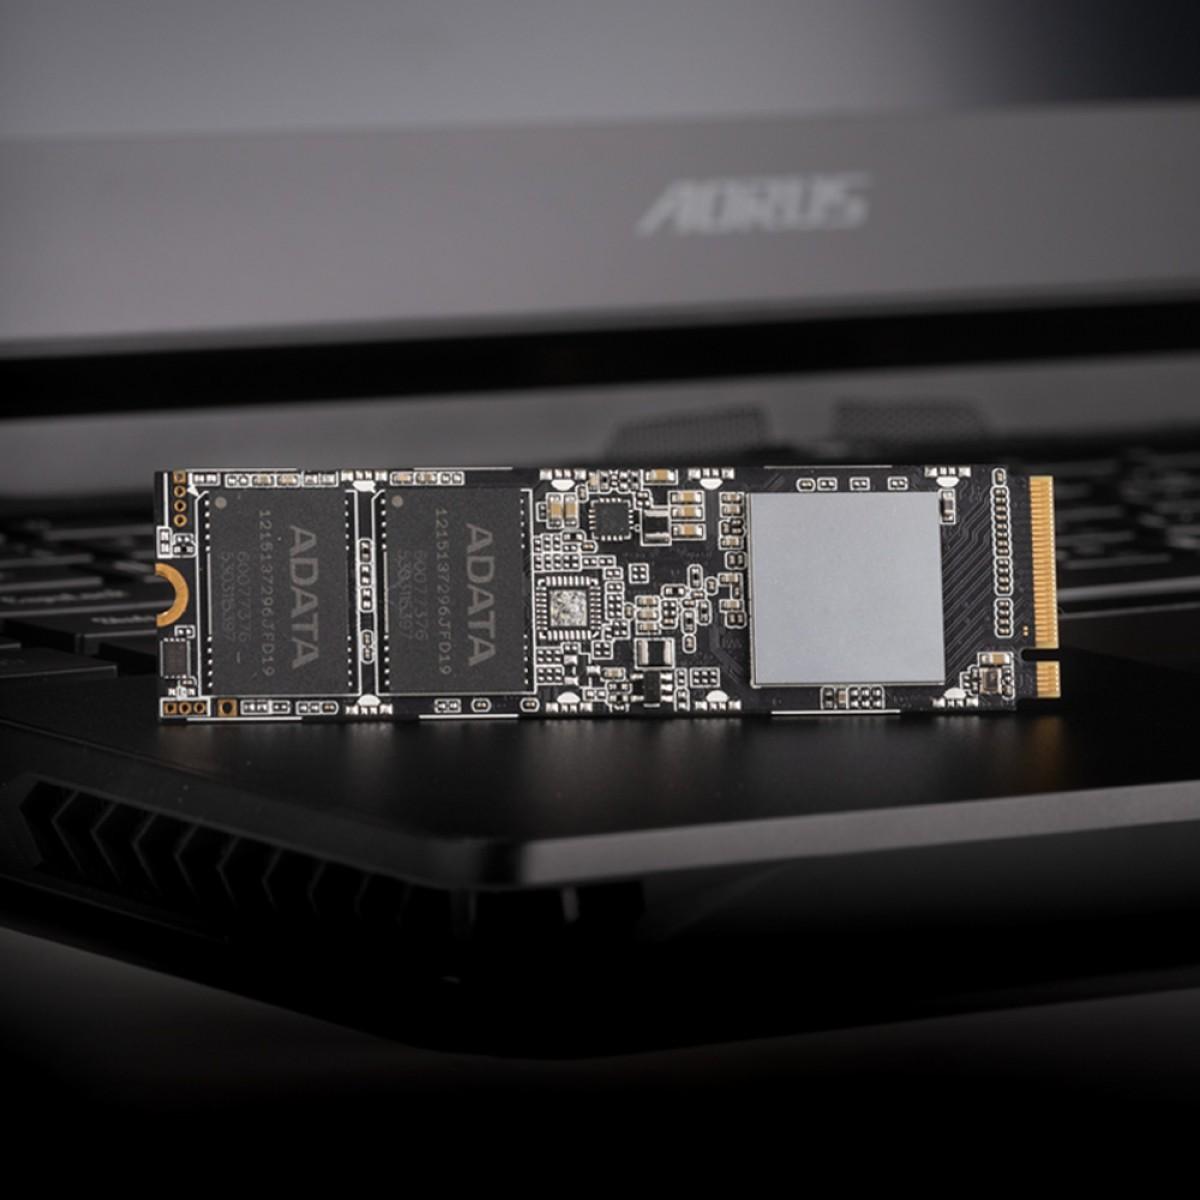 SSD Adata XPG SX8100 256GB, M.2 2280, Leitura 3500MBs e Gravação 3000MBs, ASX8100NP-256GT-C